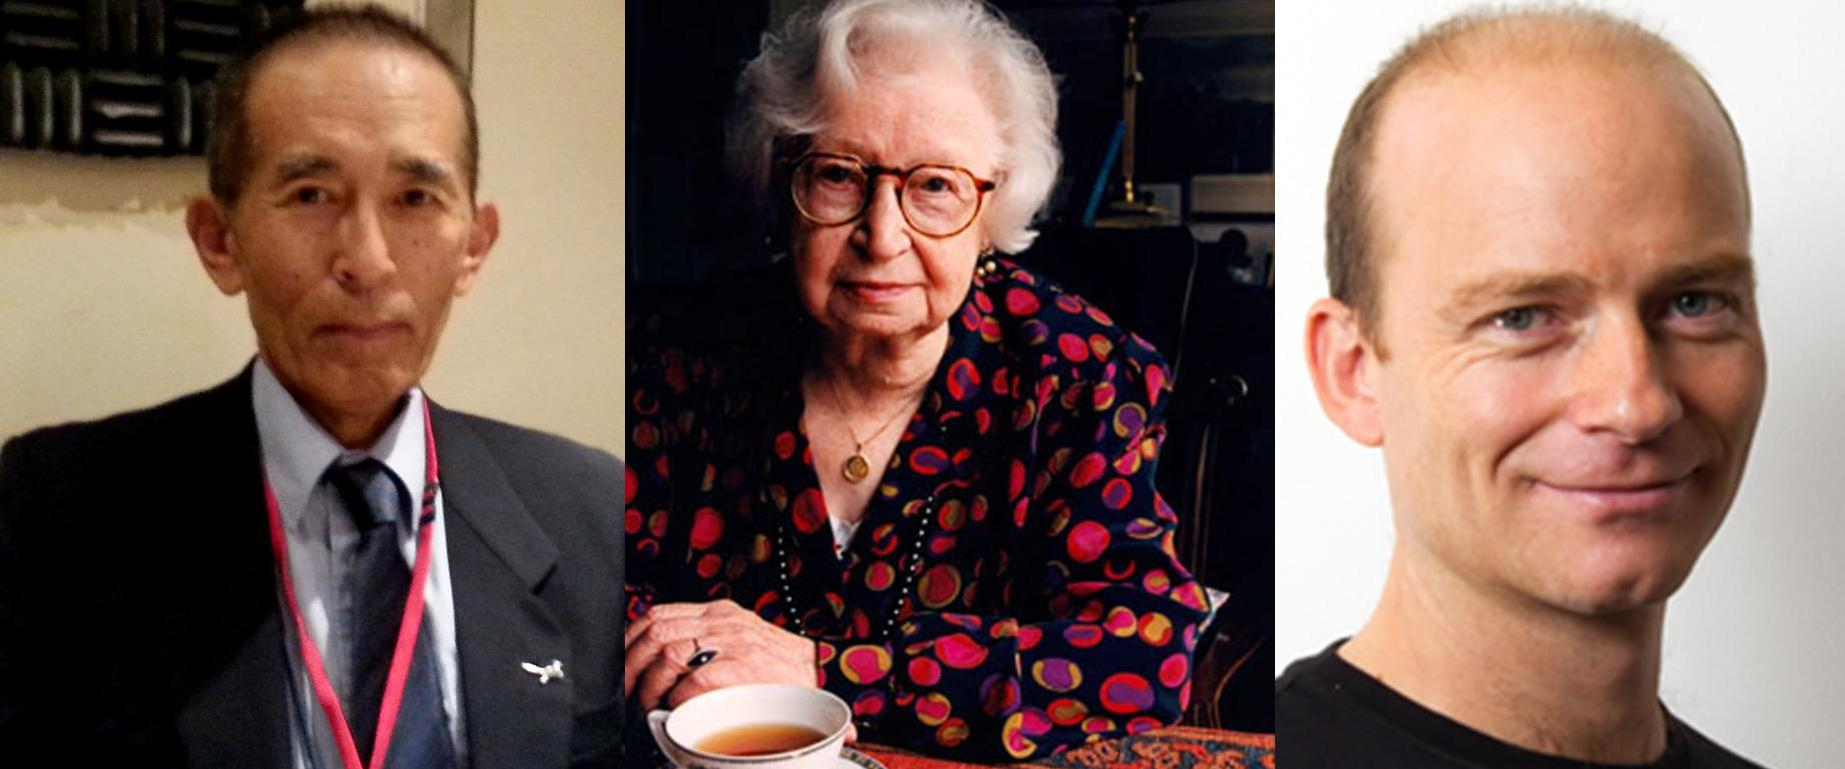 Caption: Soh Horie/Miep Gies/Jamie Drummond